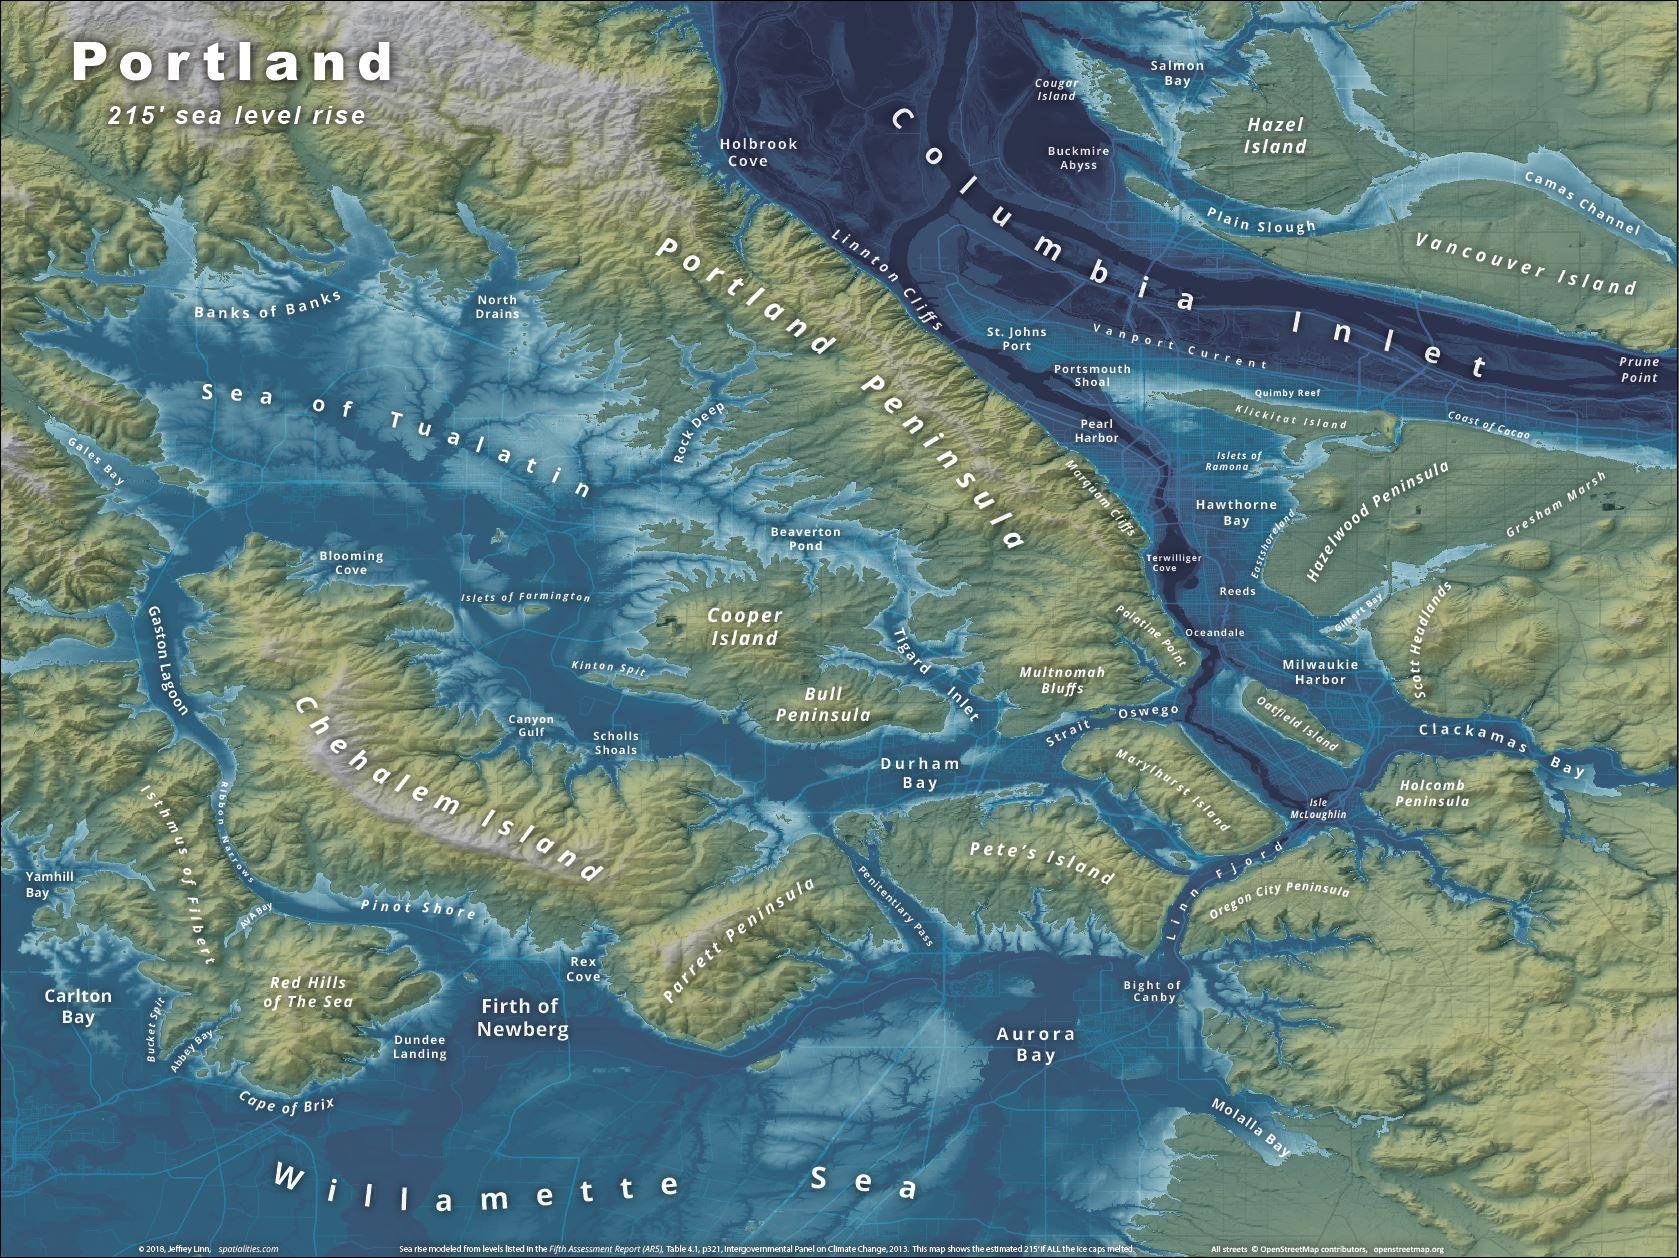 Islands of Portland | Spatialities on